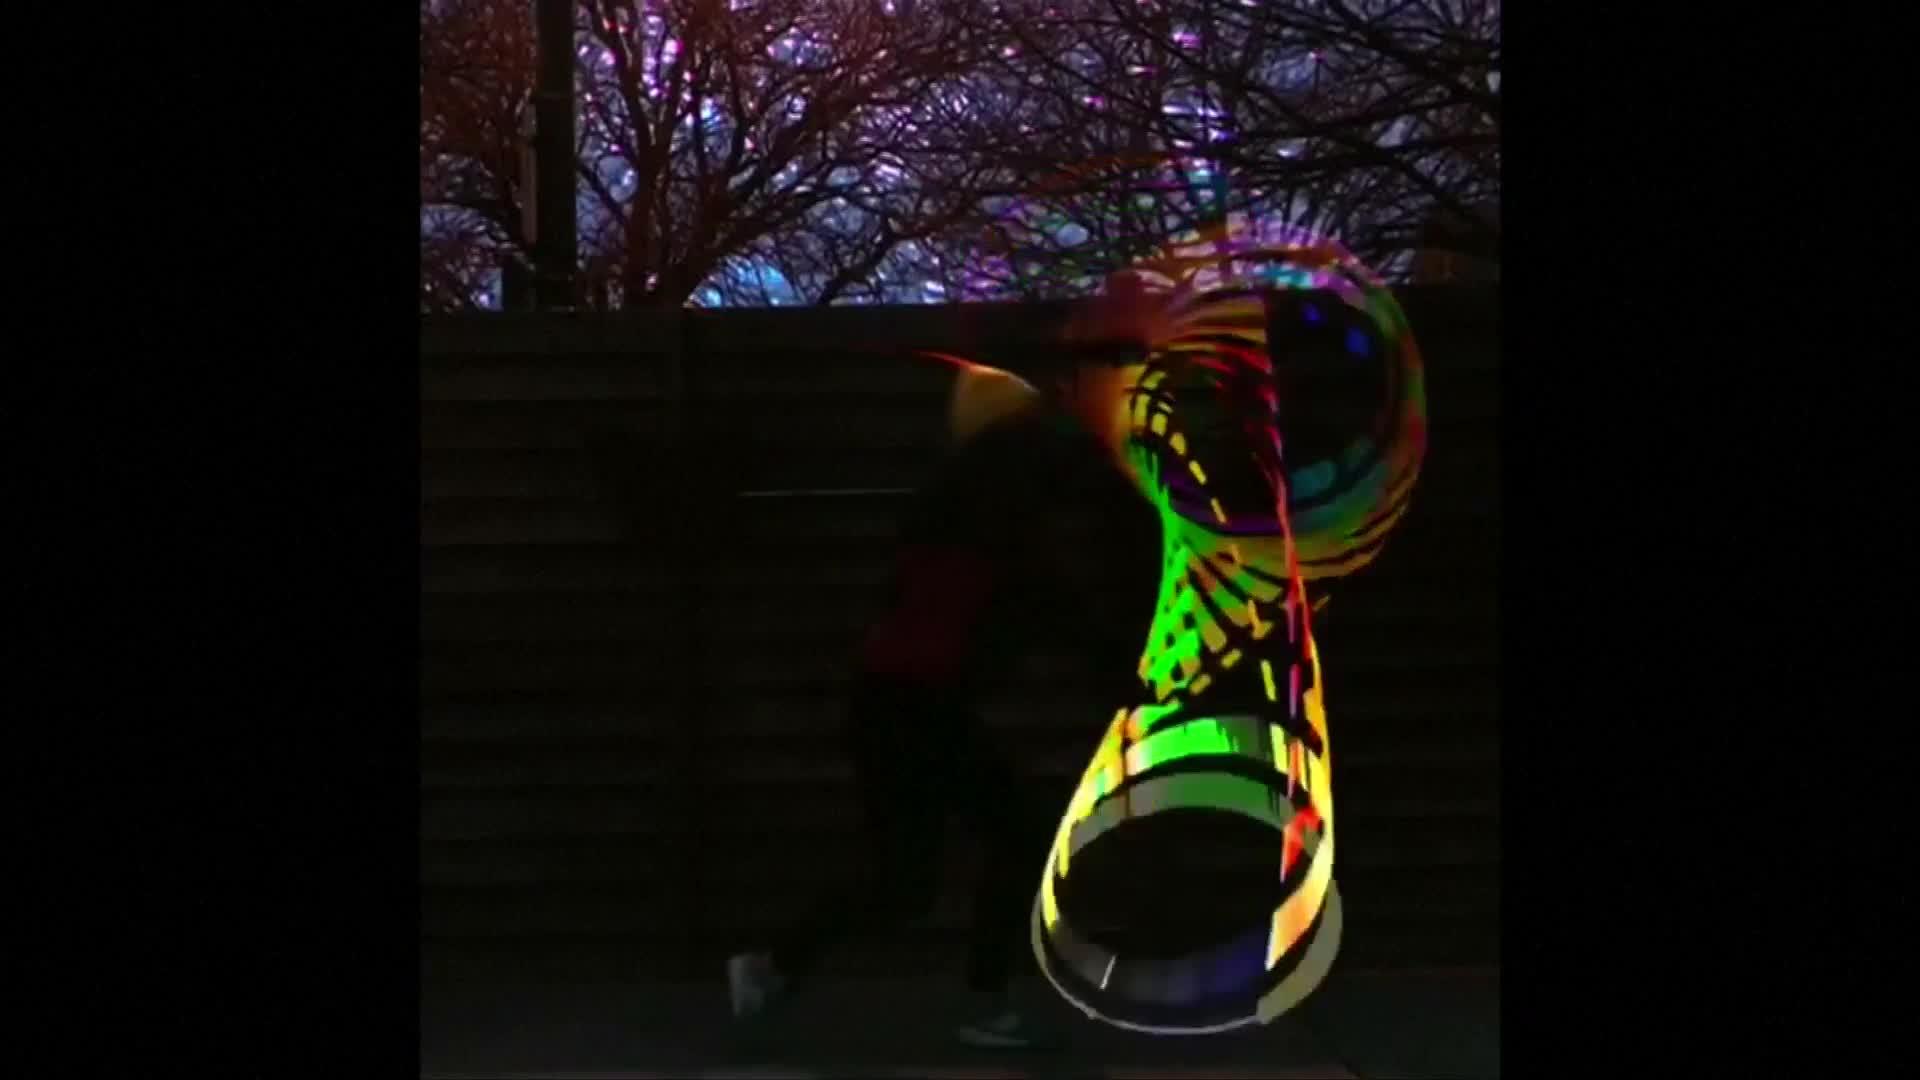 Chicago woman makes hypnotic hula hoop video